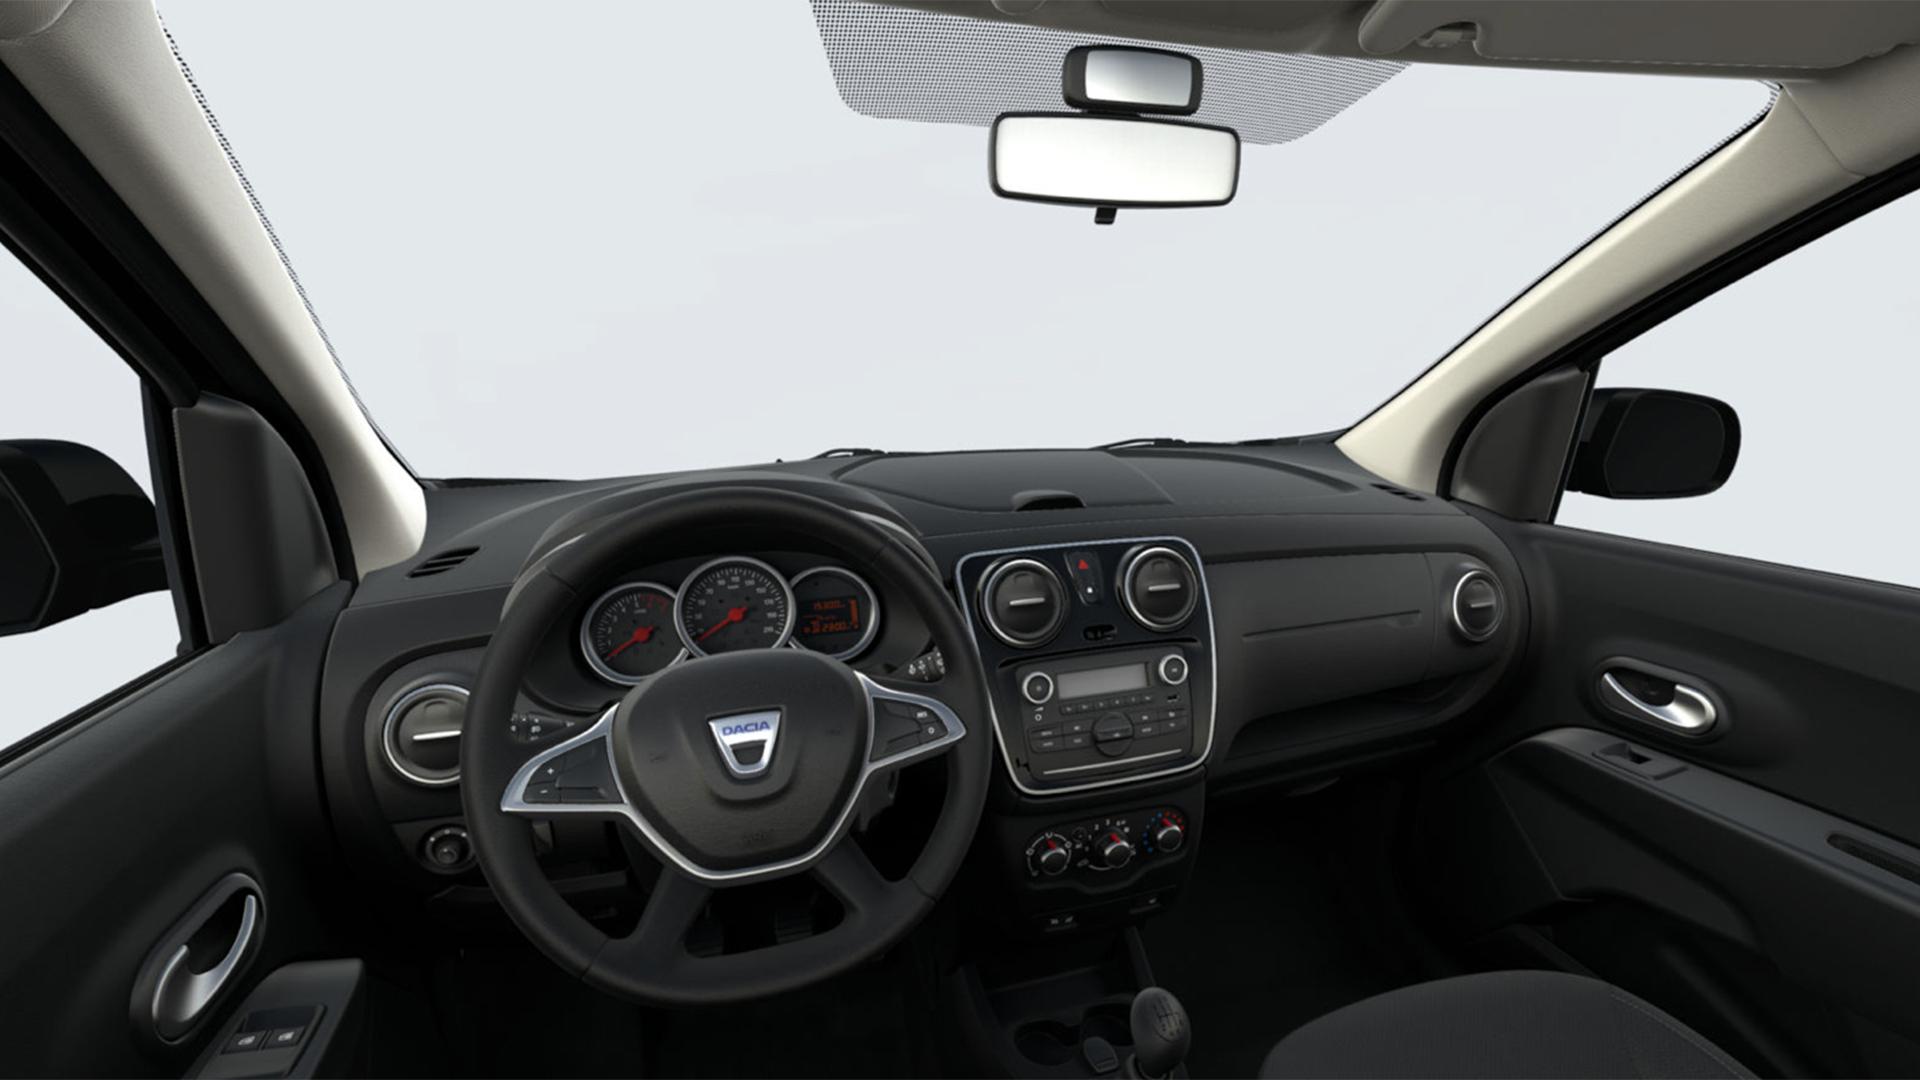 Dacia Lodgy interior